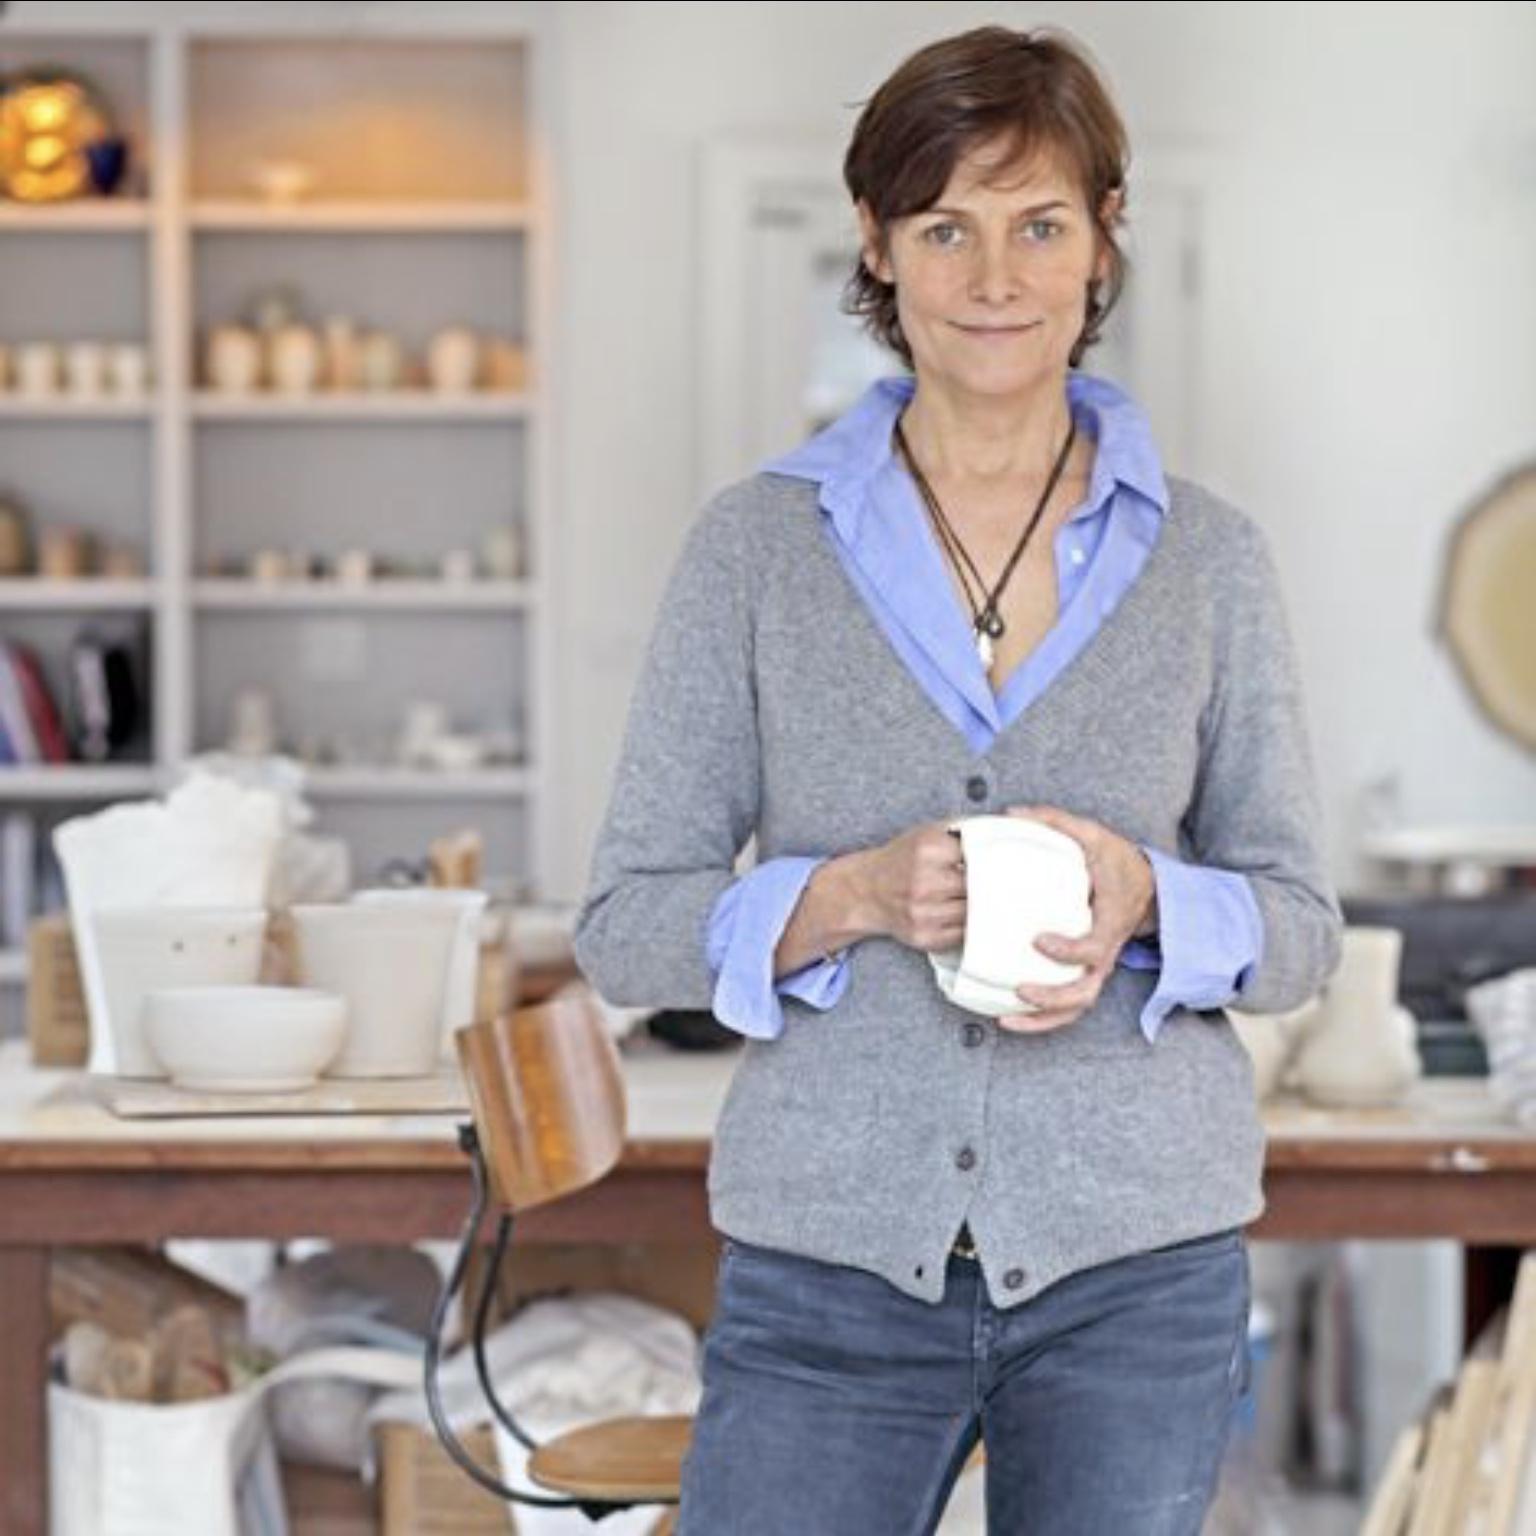 Photo of Carey standing in front of her ceramics